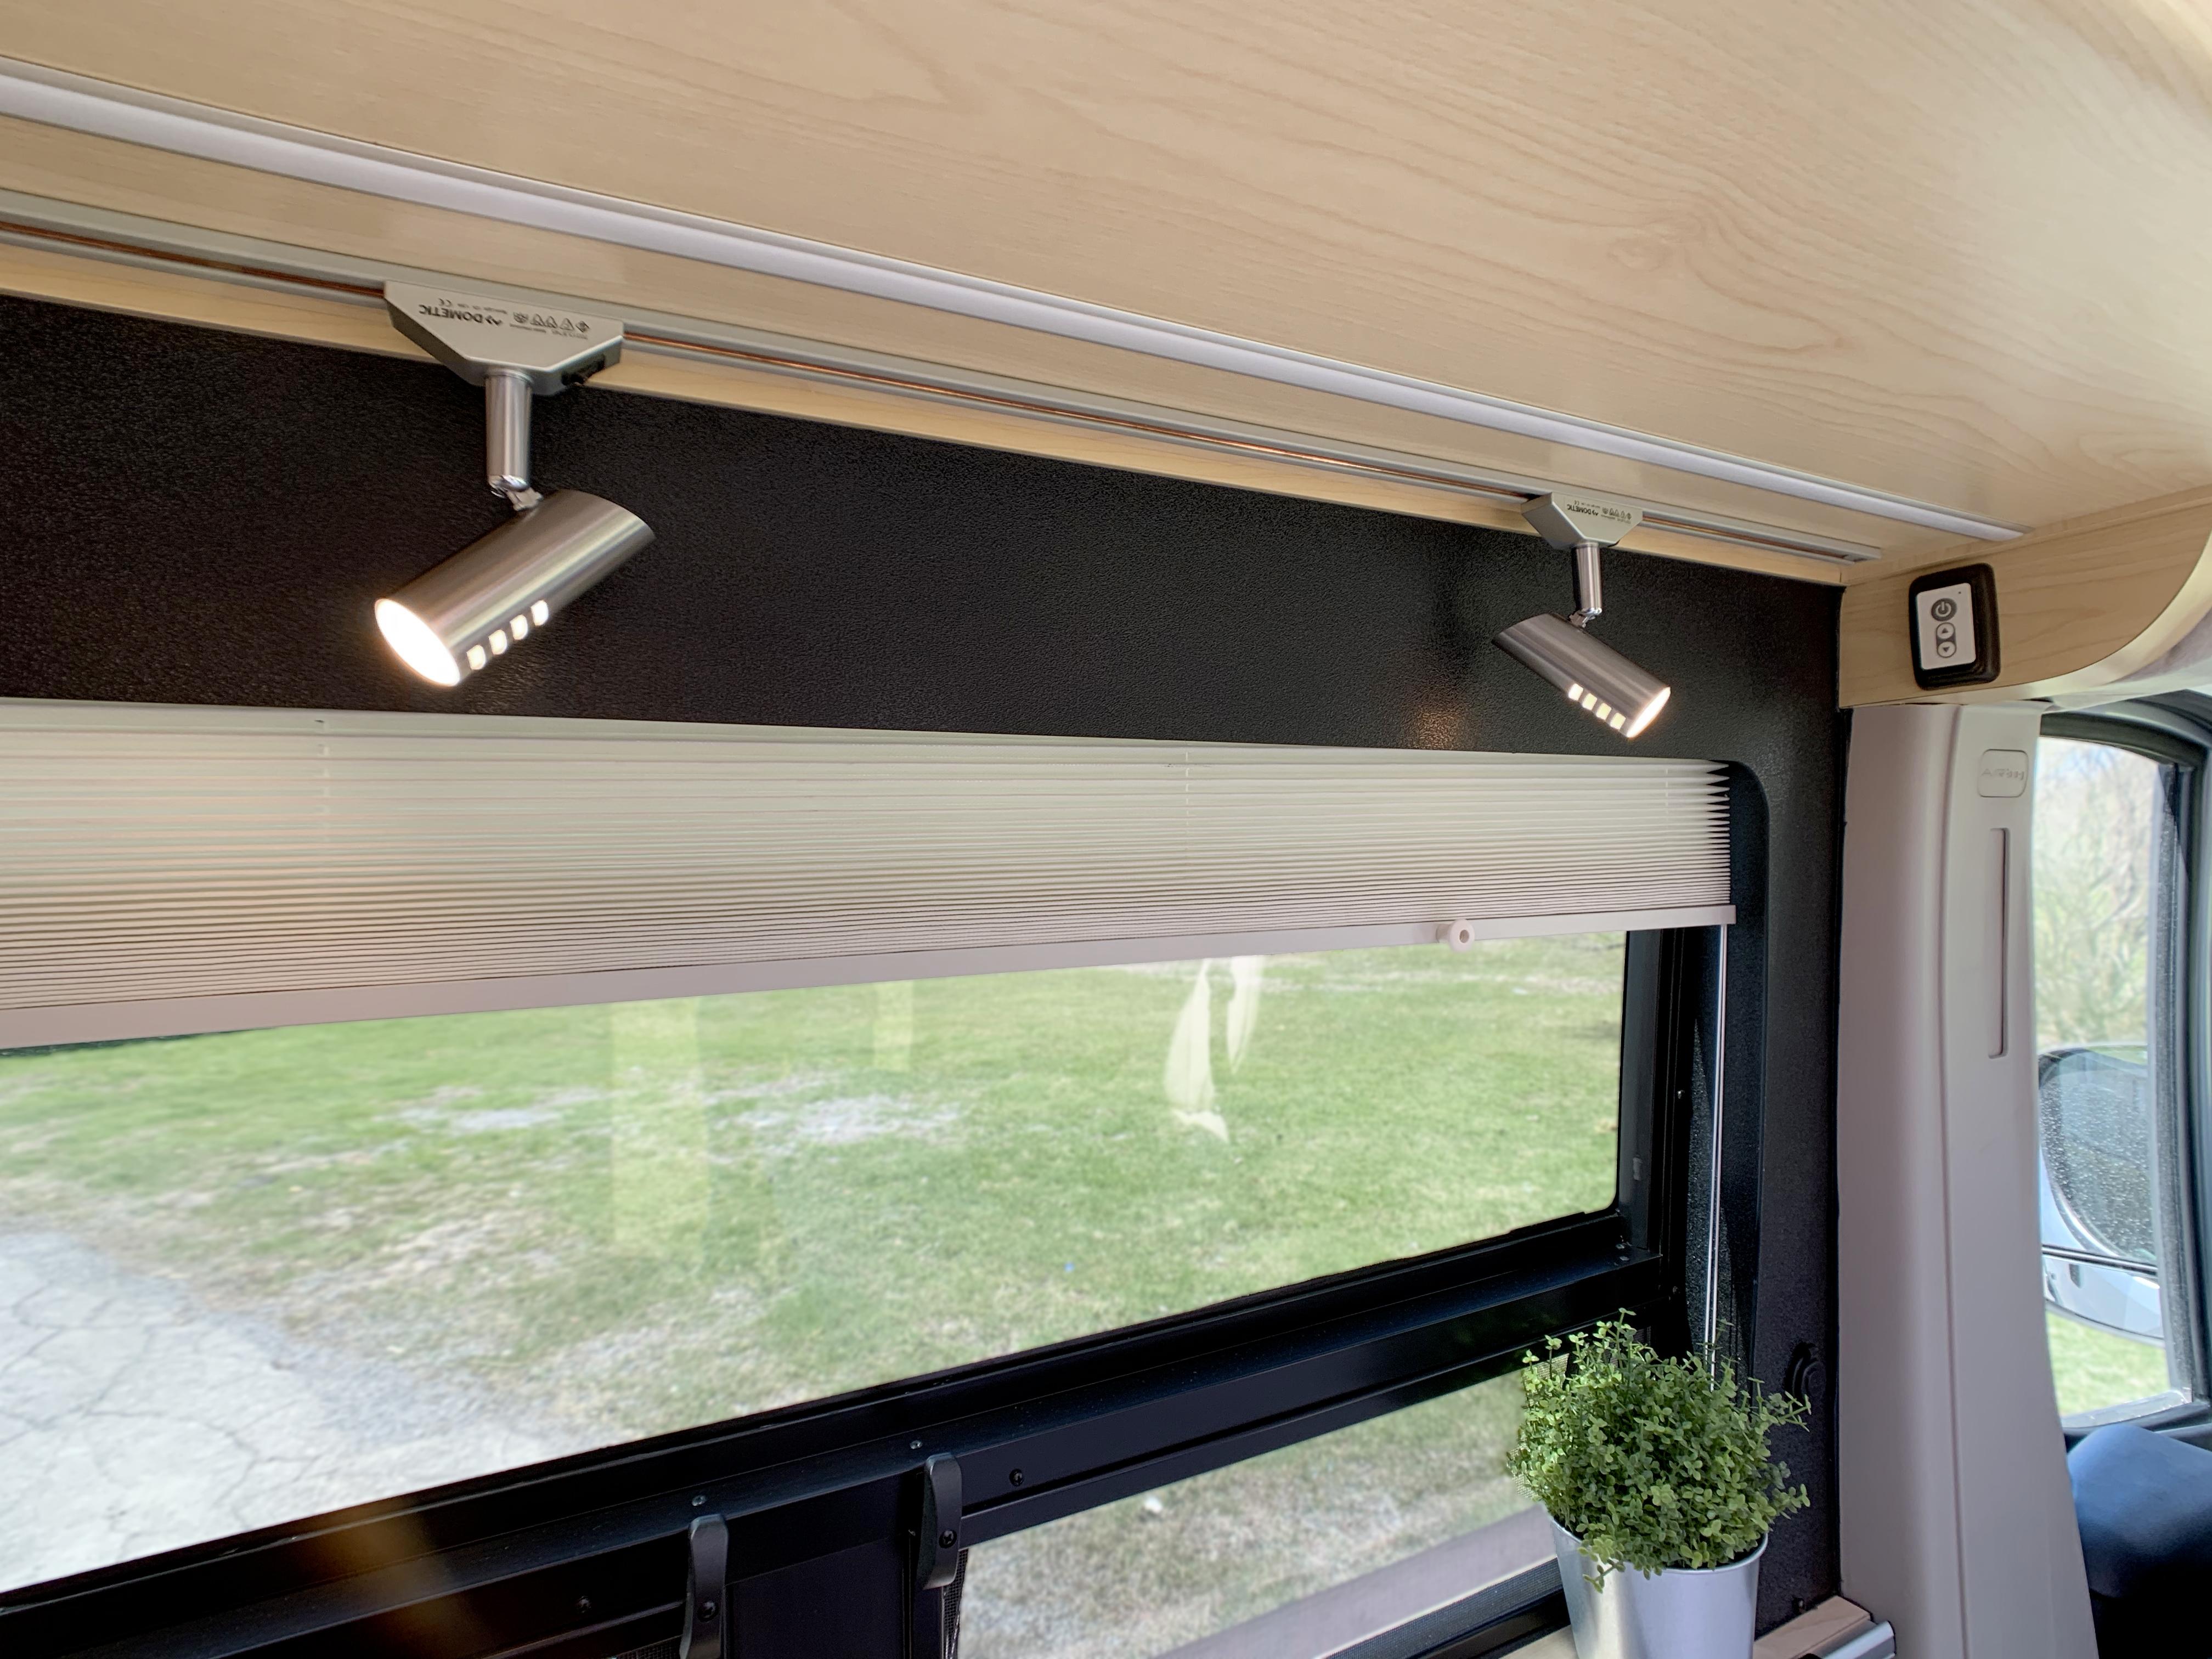 Panoramic RV - Reading lights